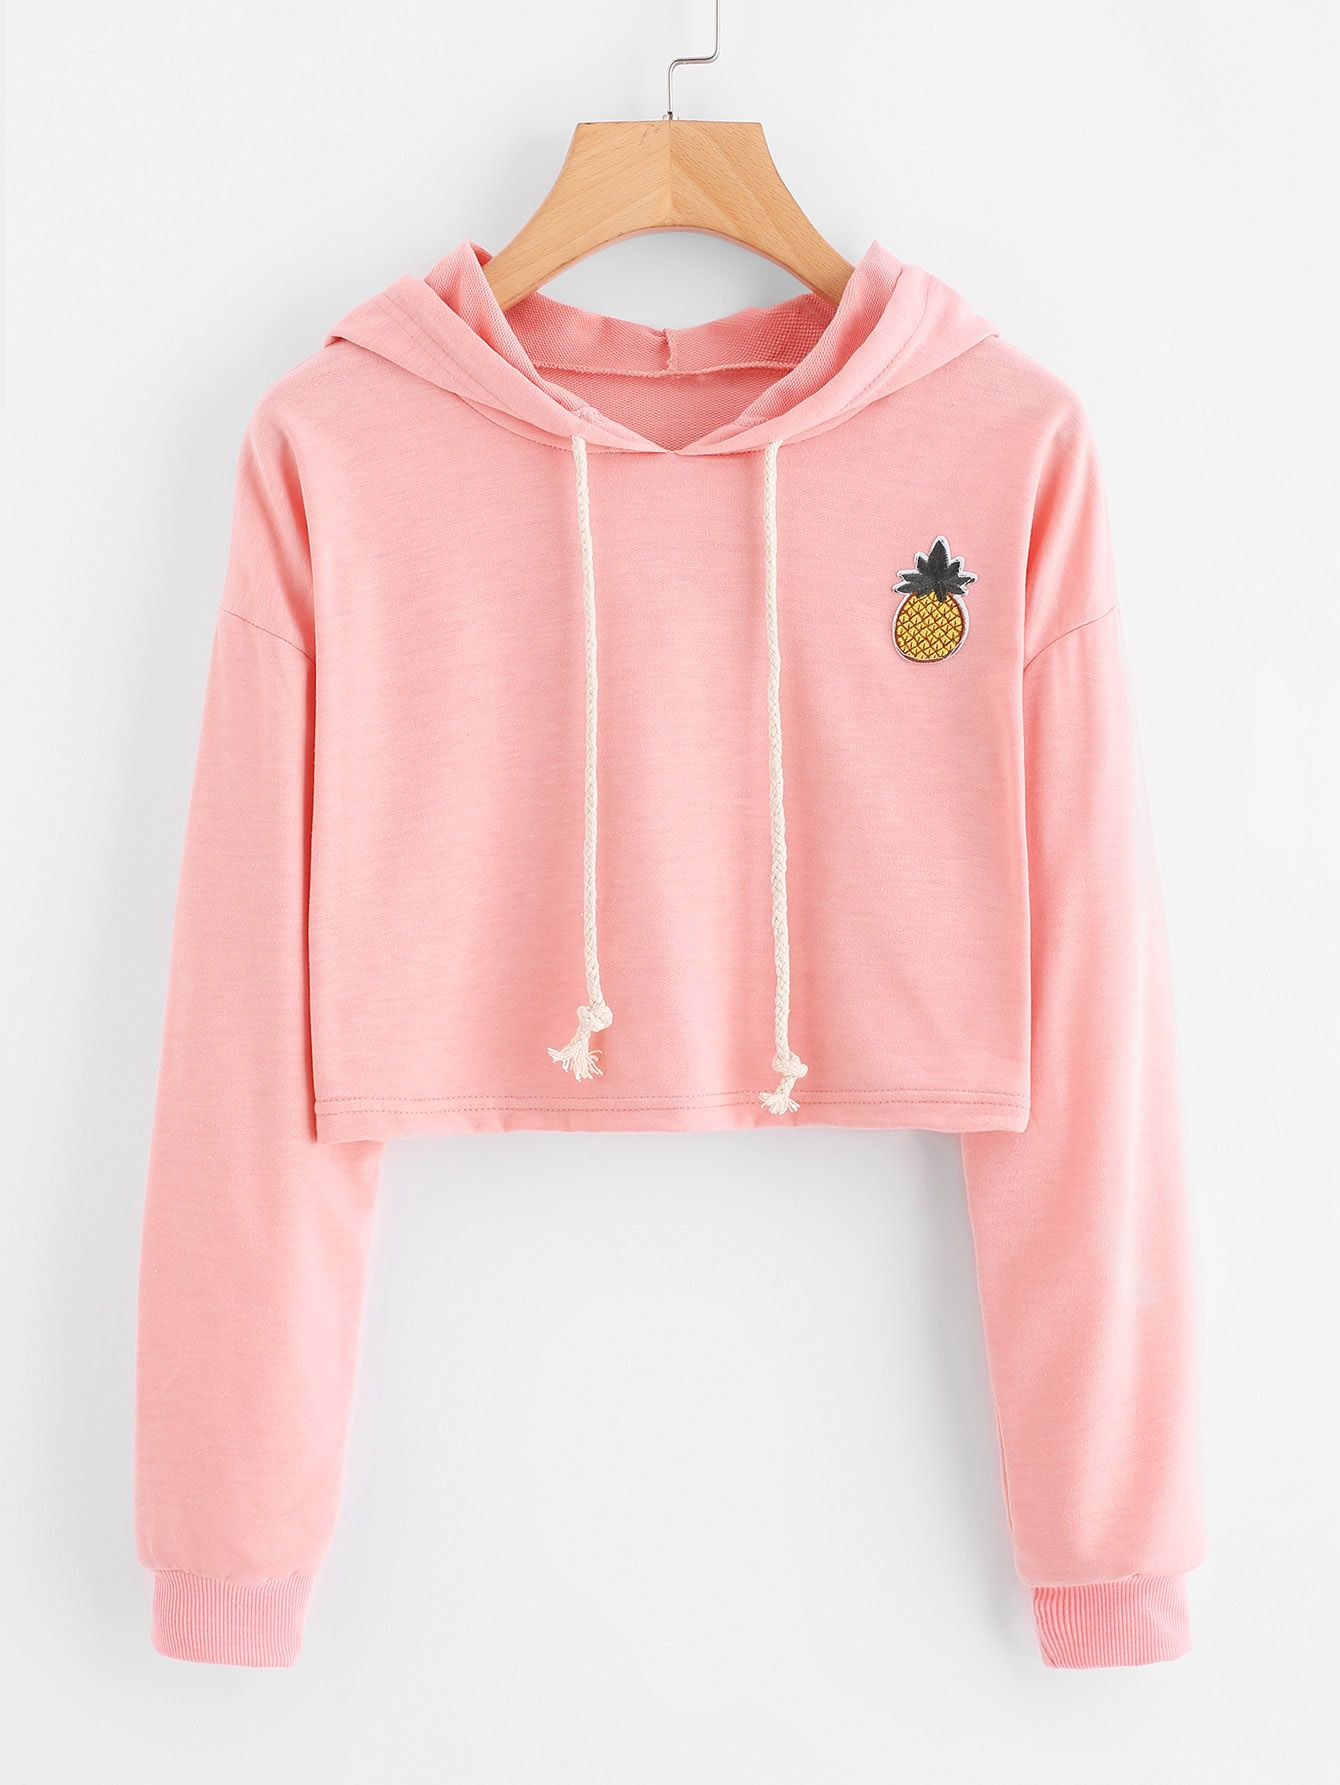 34f5b36f Pineapple Patch Crop HoodieFor Women-romwe   Shirts in 2019 ...